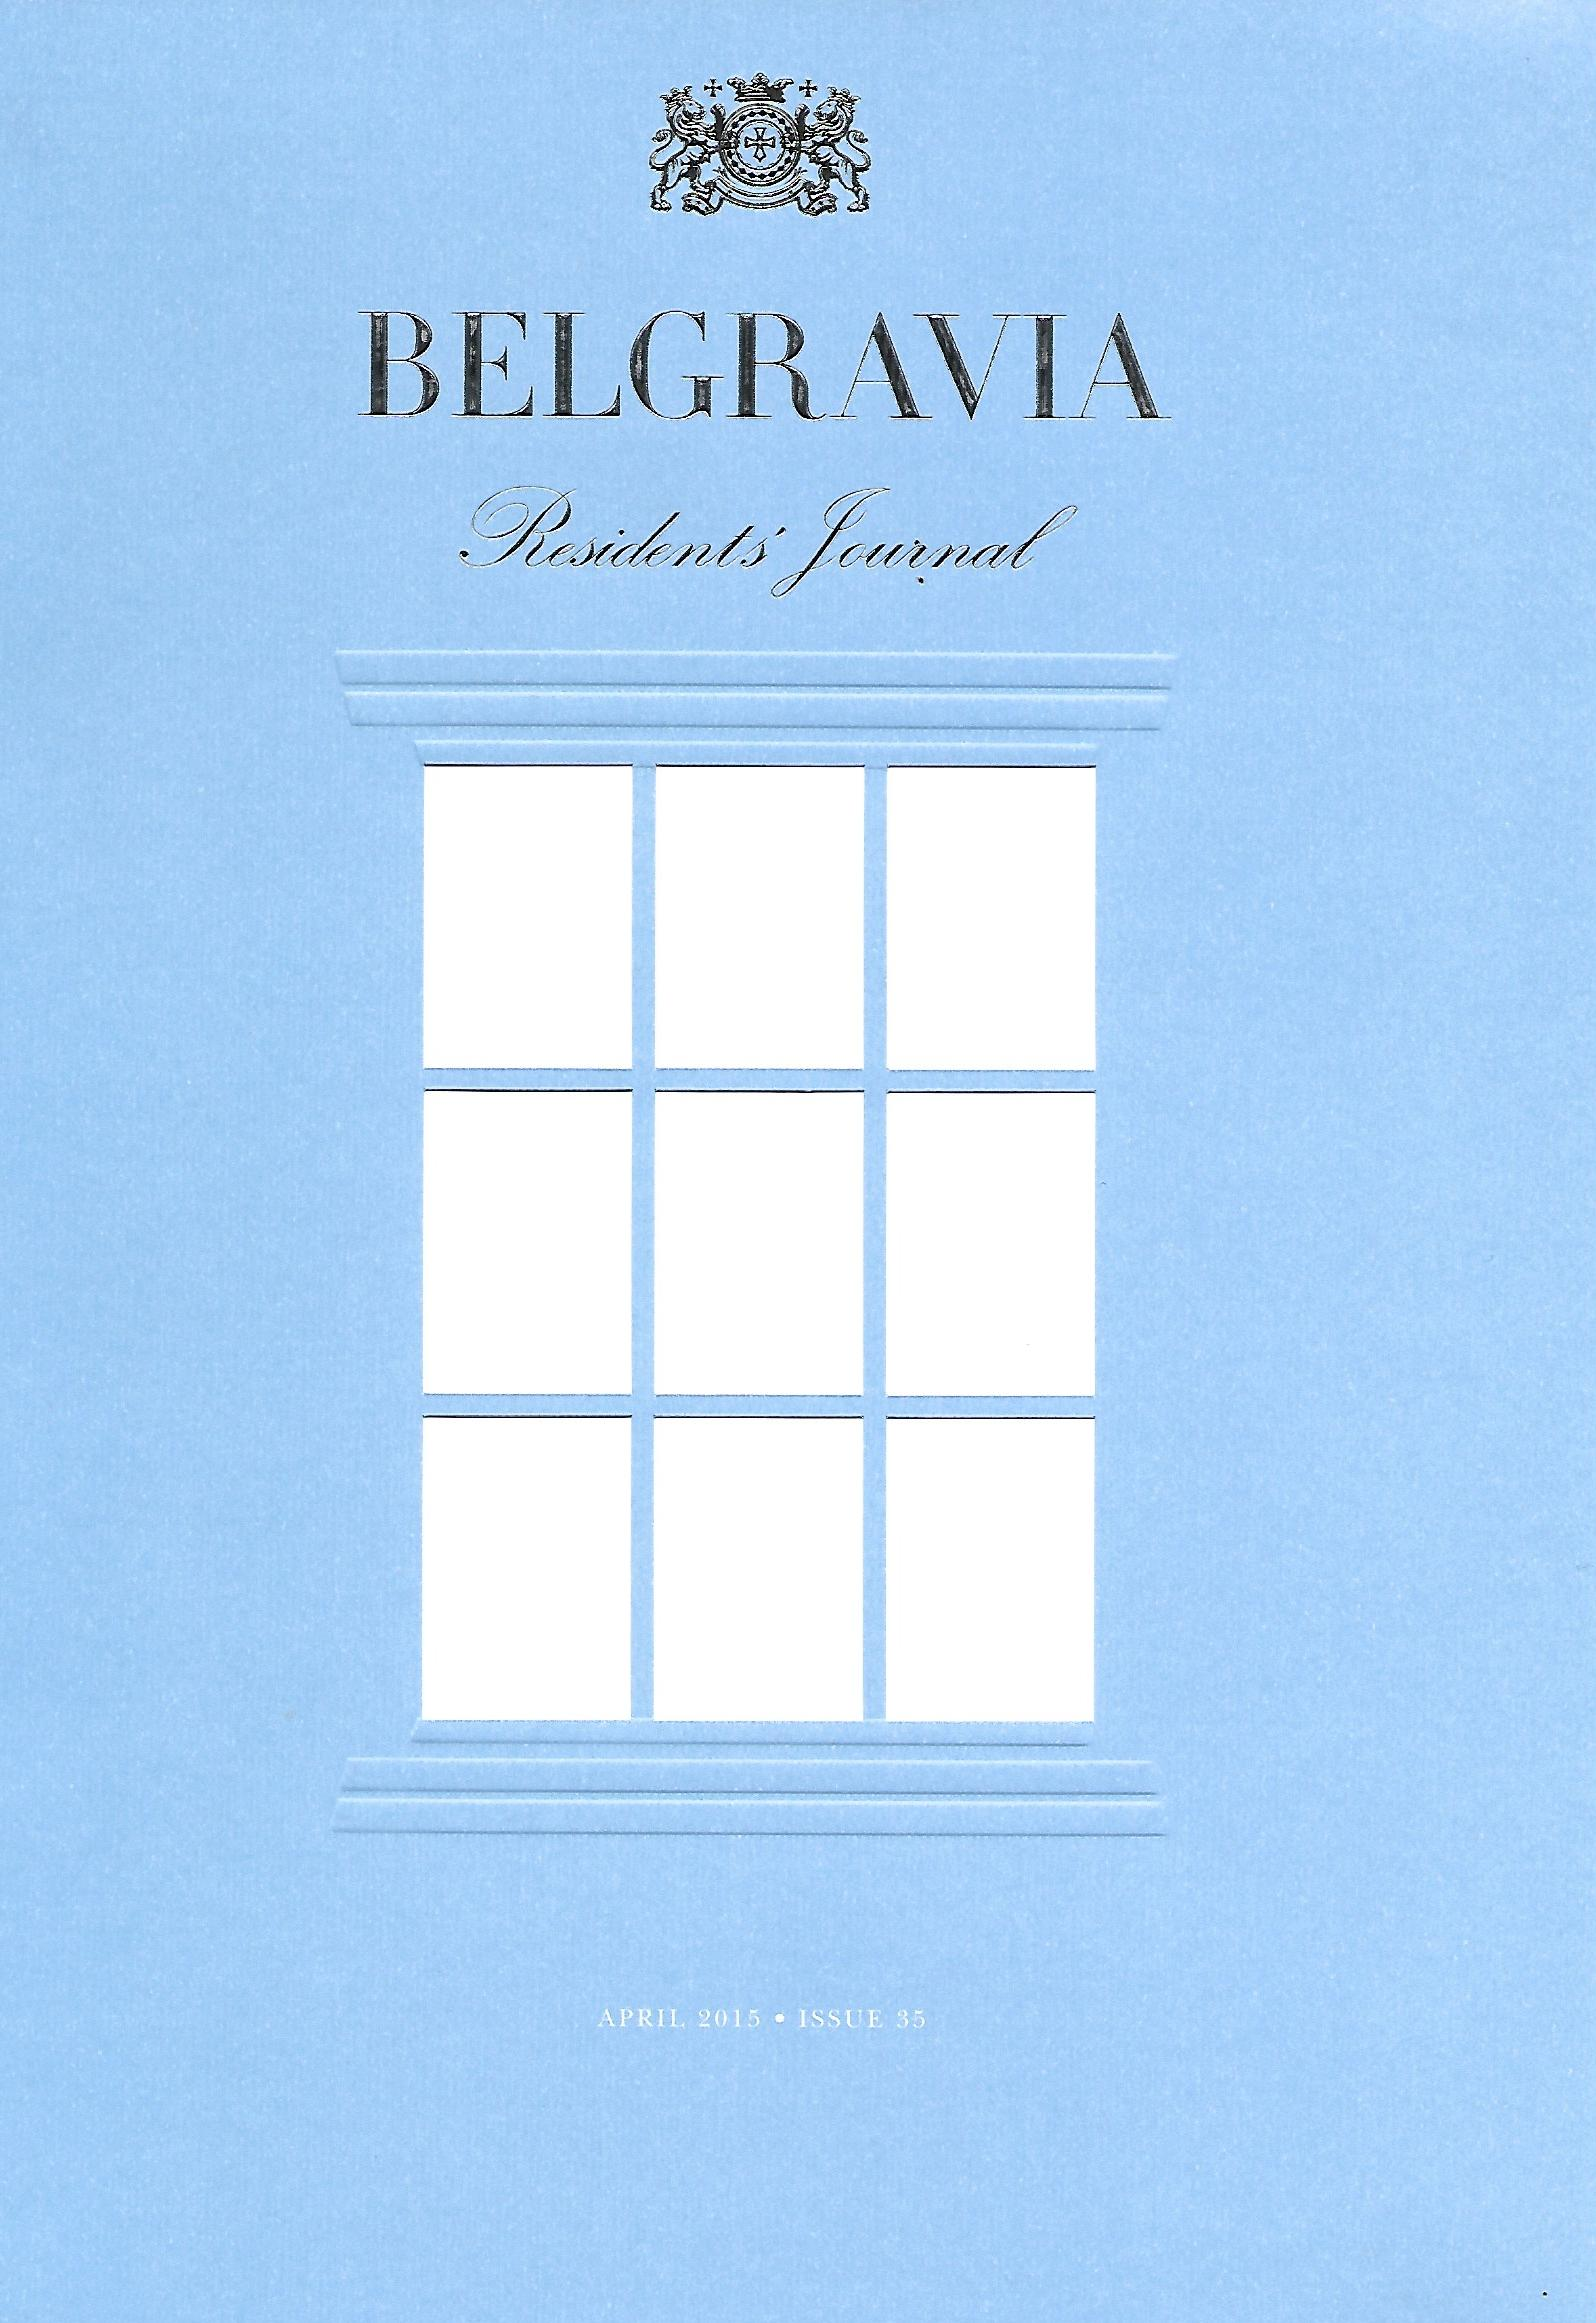 BELGRAVIA RESIDENTS JOURNAL